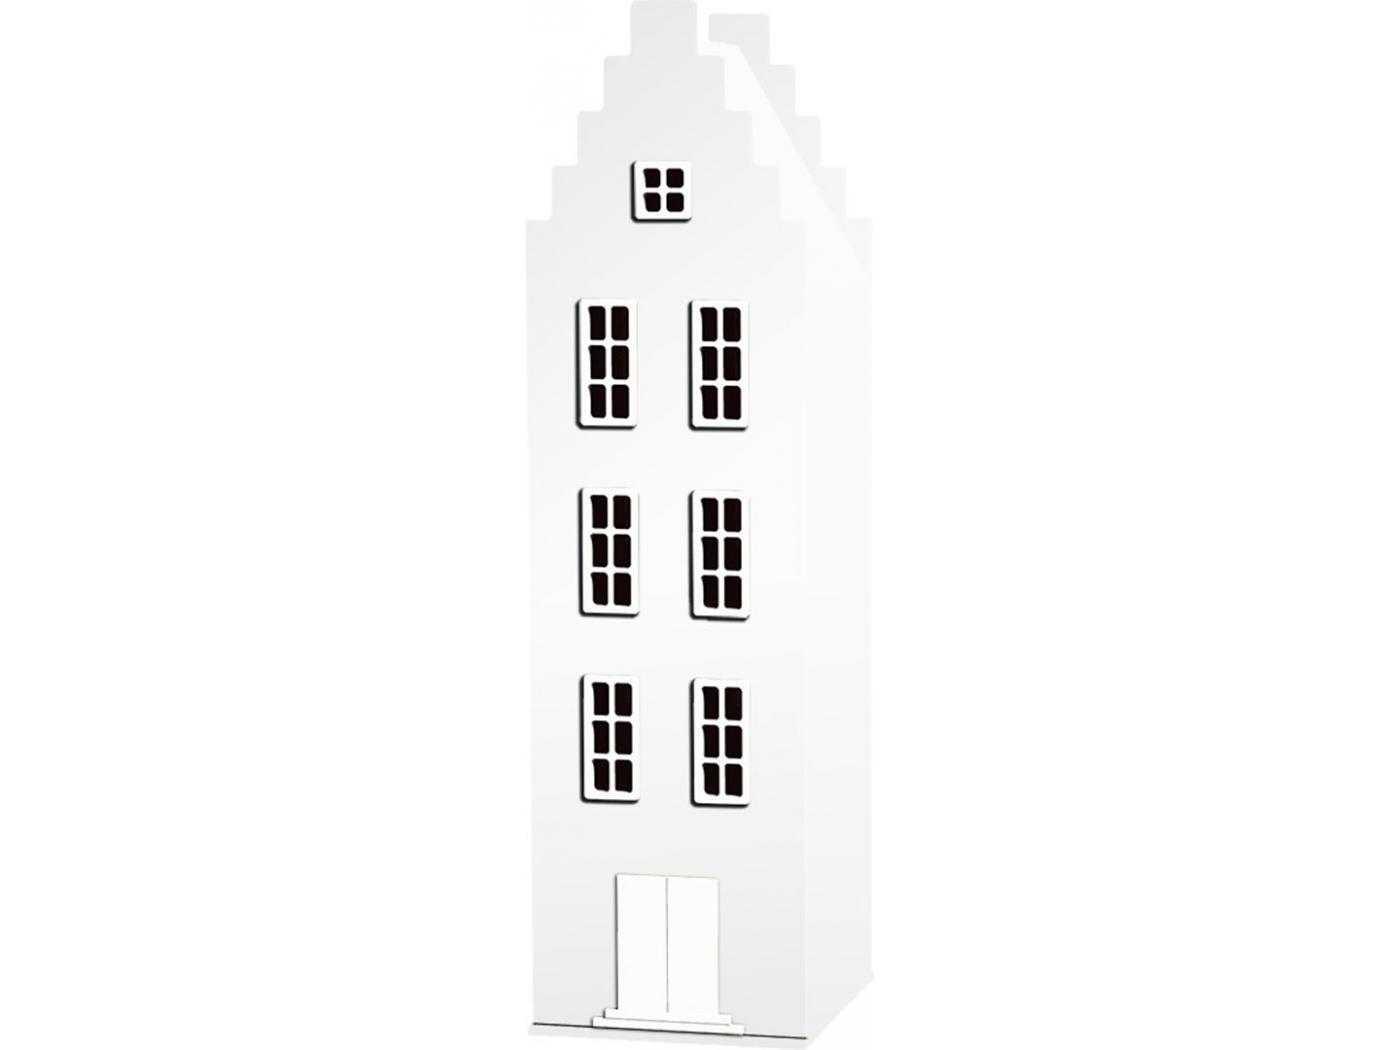 kast-van-een-huis-armoire-amsterdam-cmonpremier